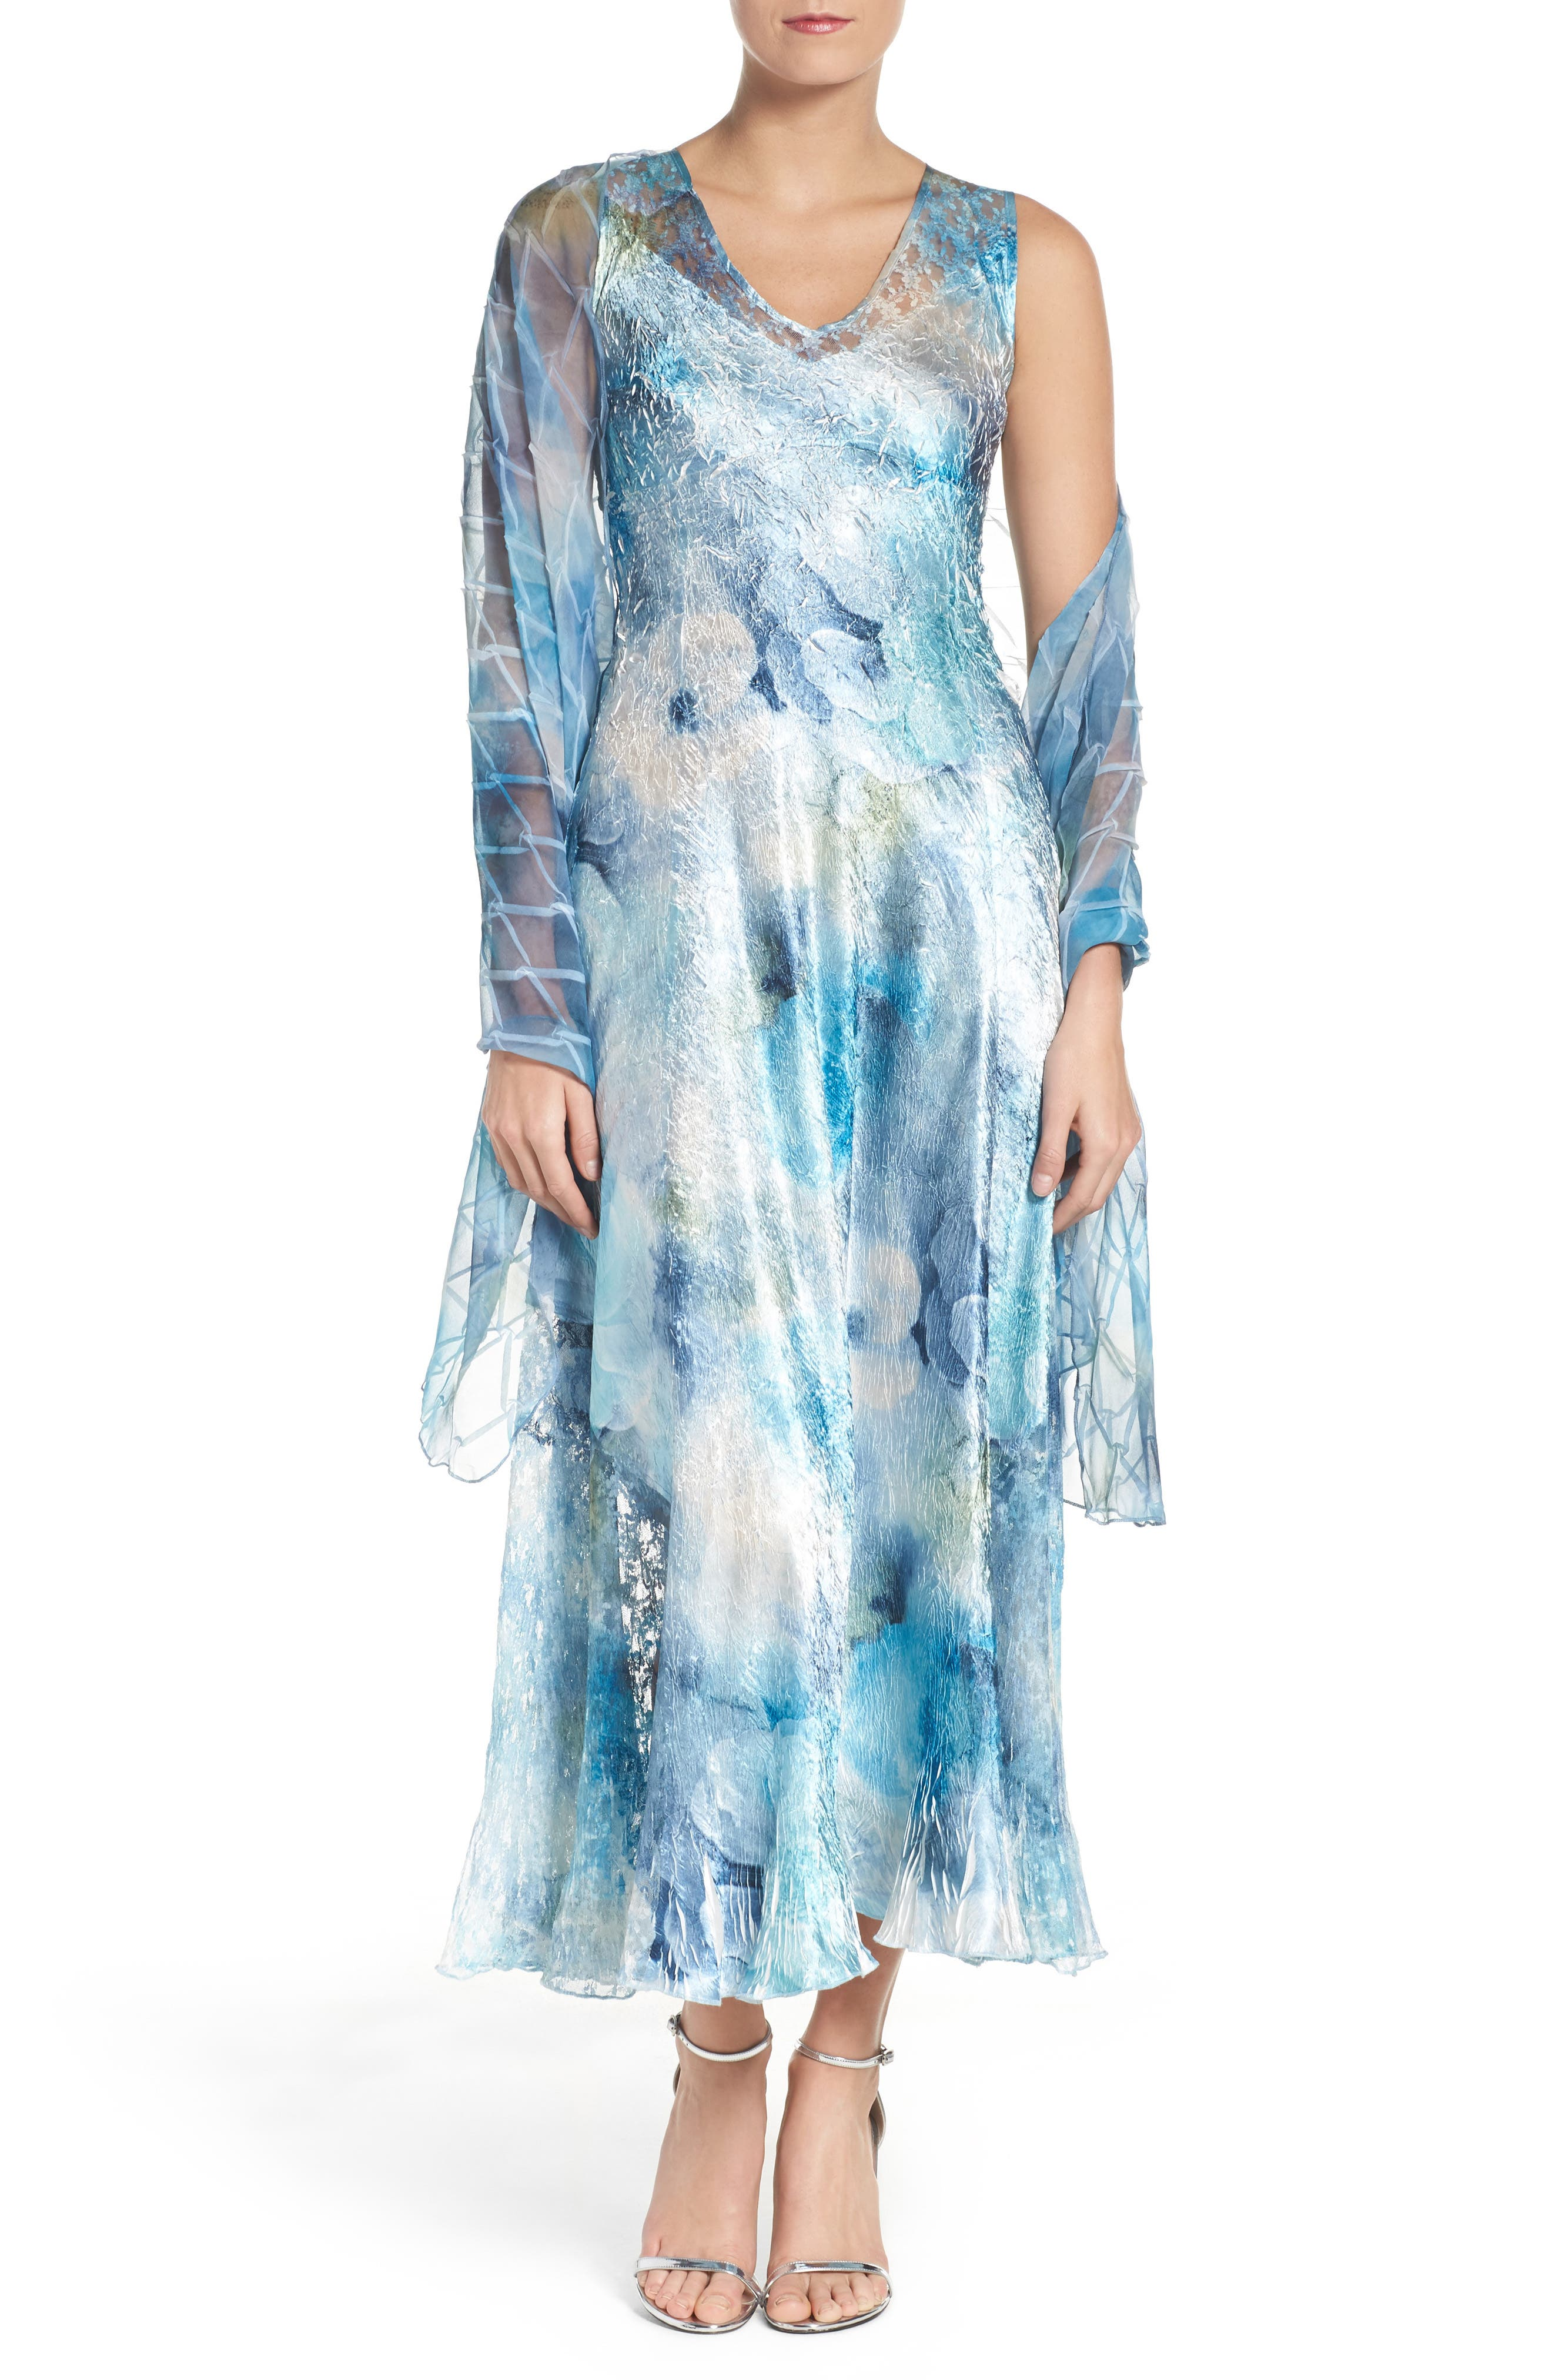 KOMAROV A-Line Chiffon Dress & Shawl